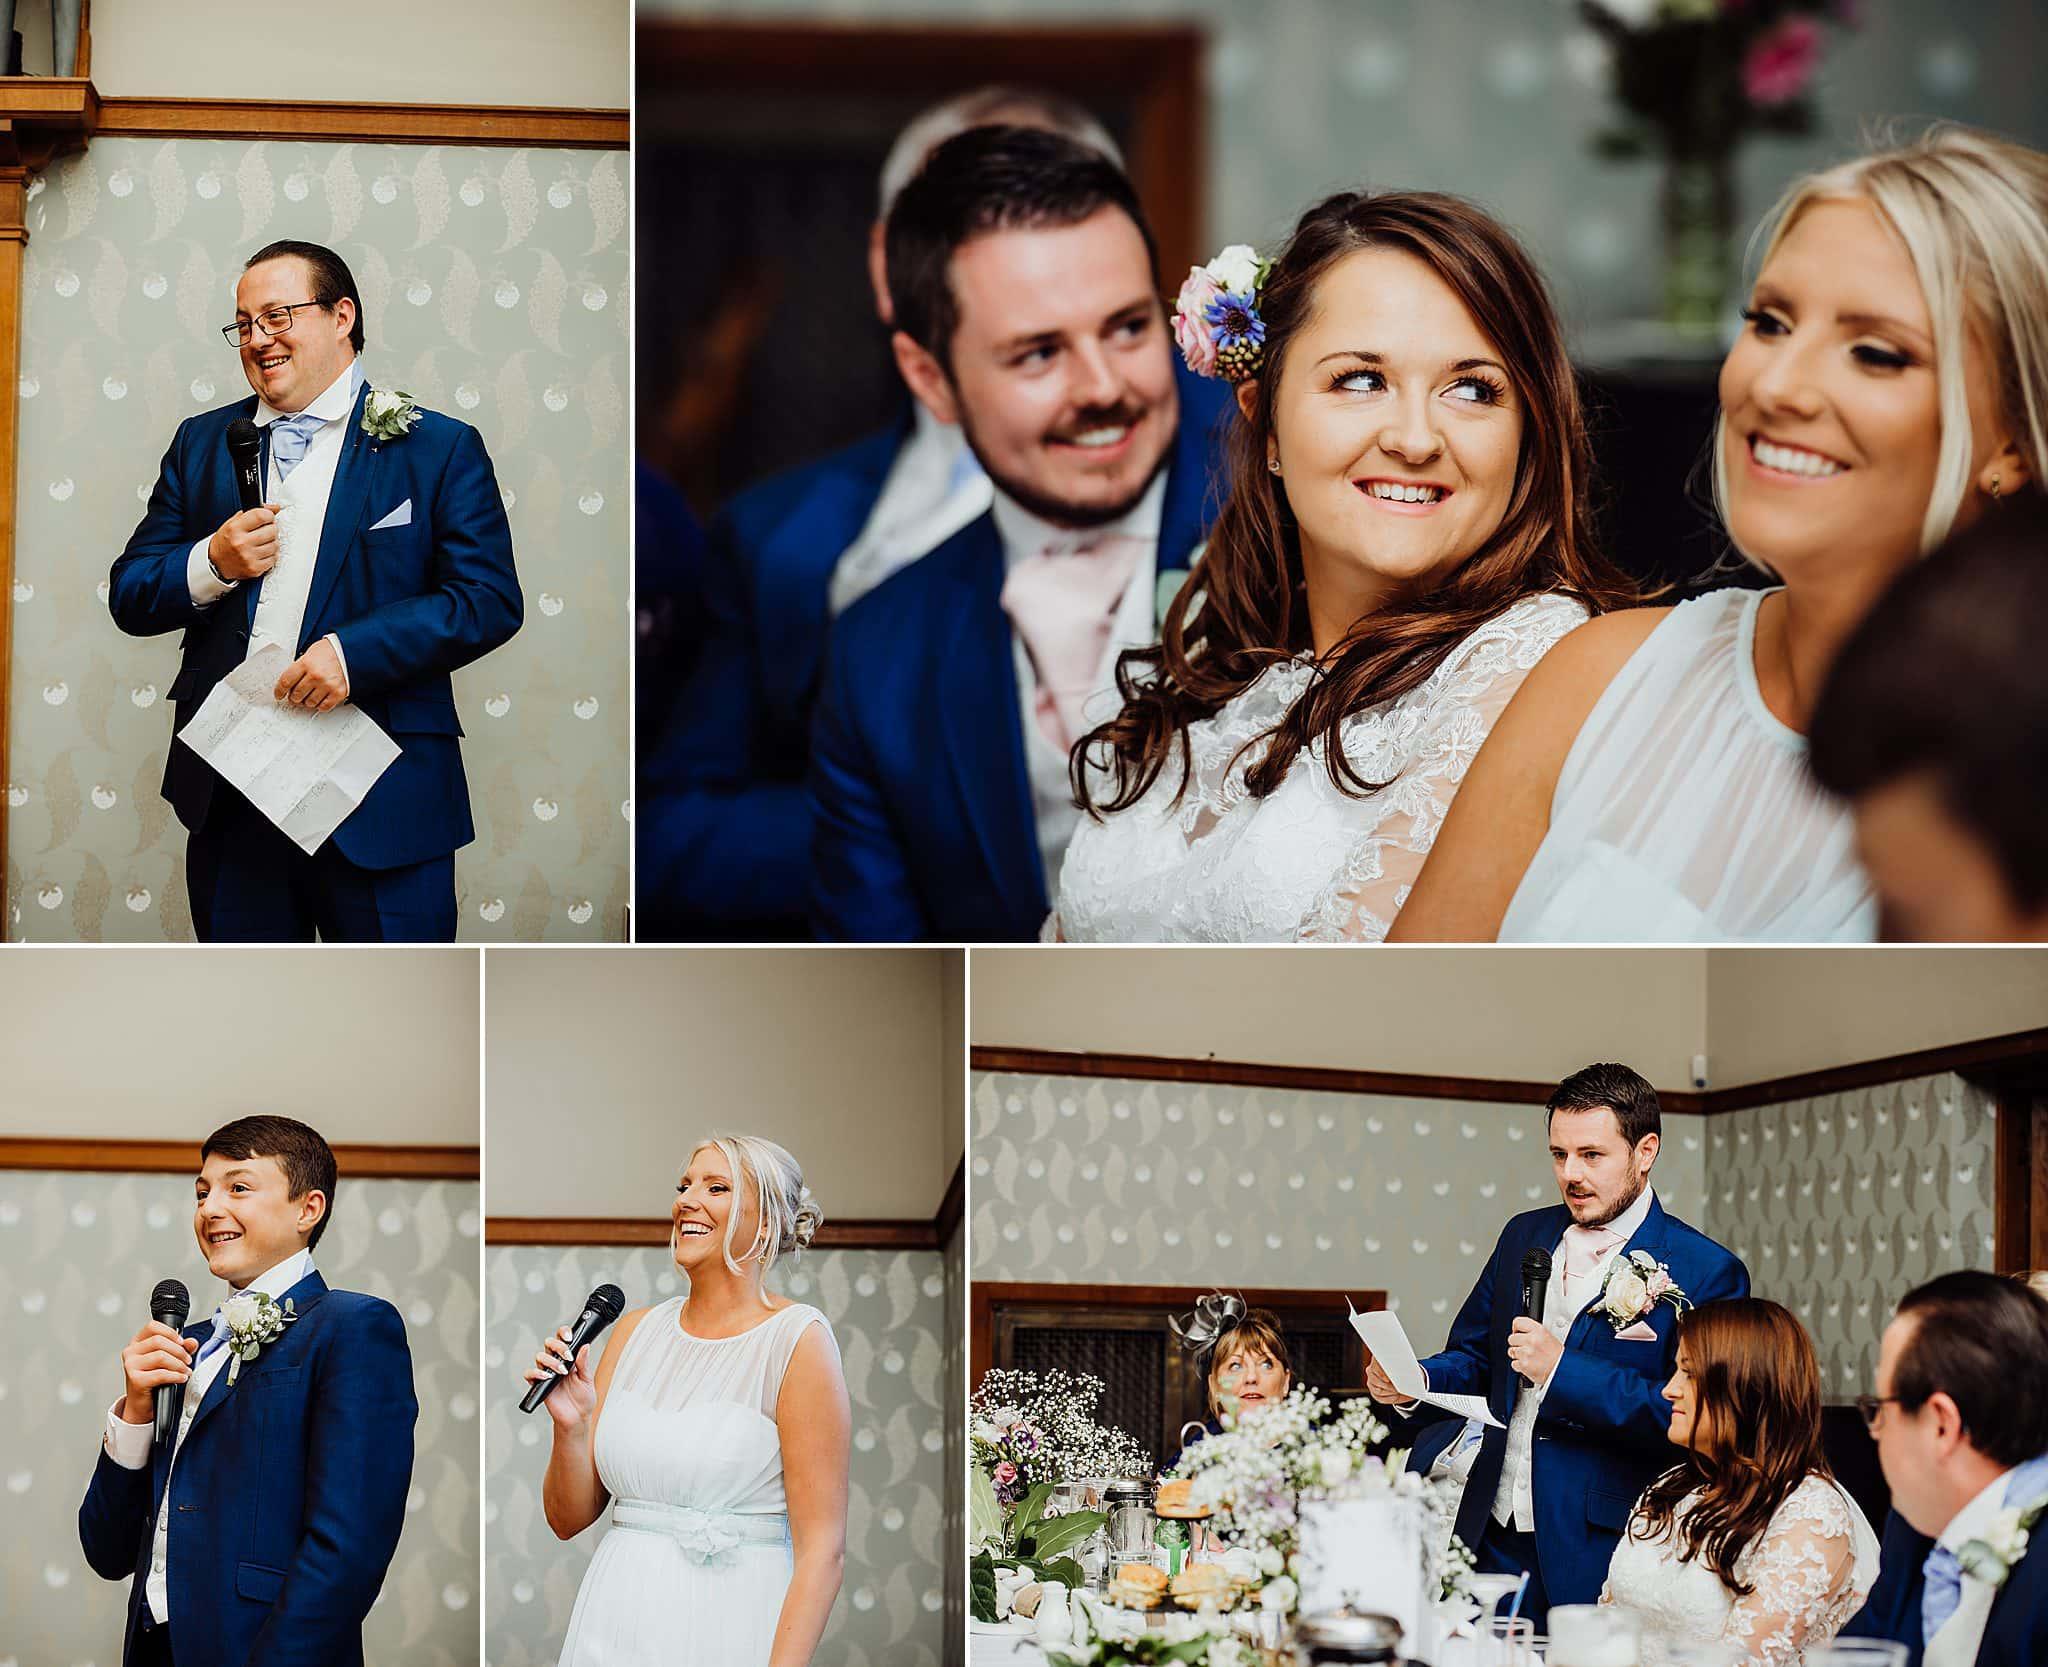 Wedding speeches at Gregnog Hall